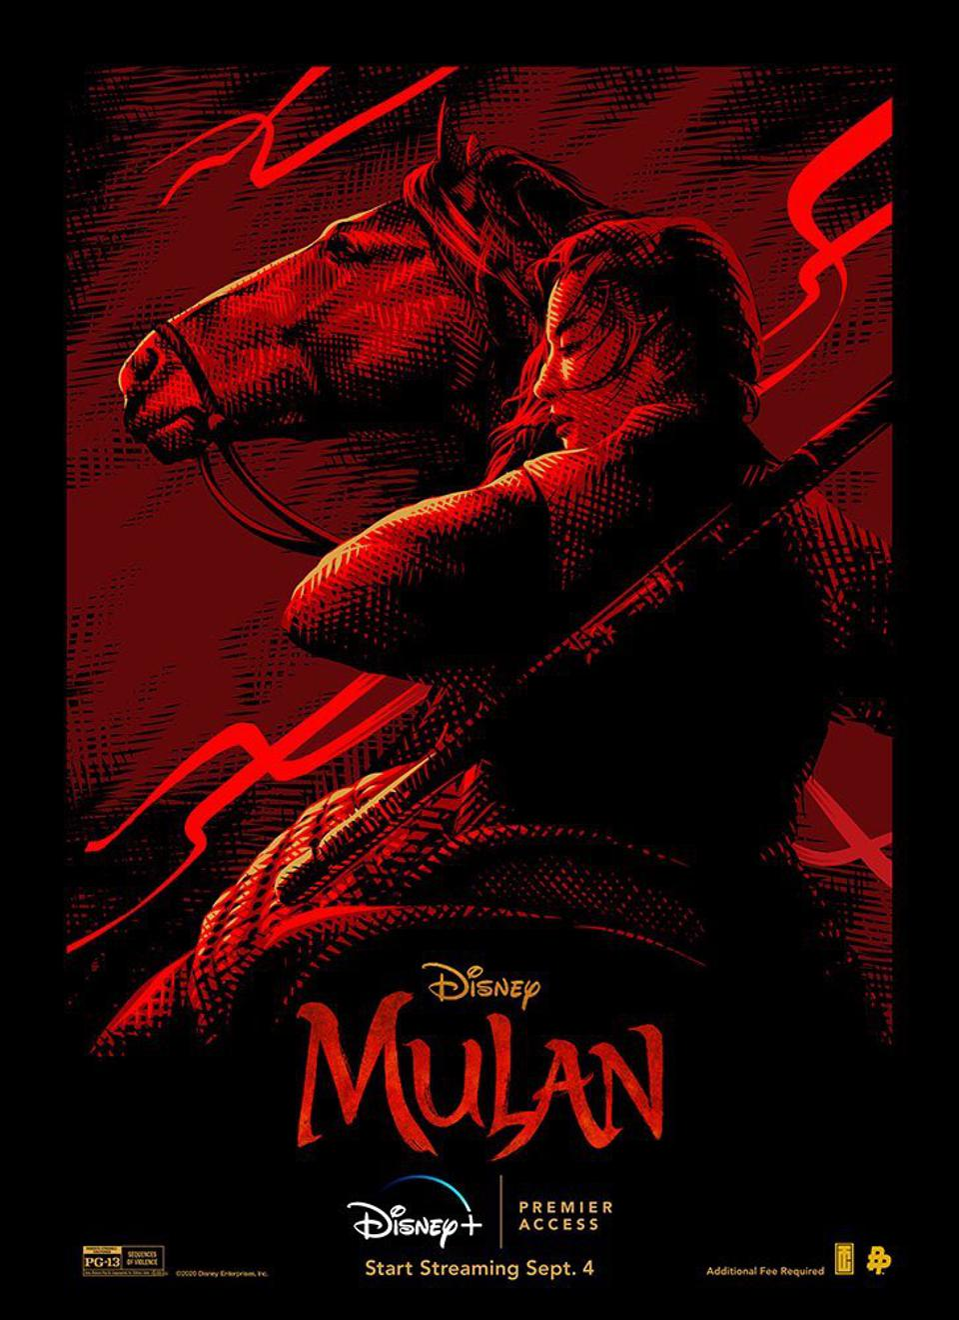 Official poster for Disney's ″Mulan.″